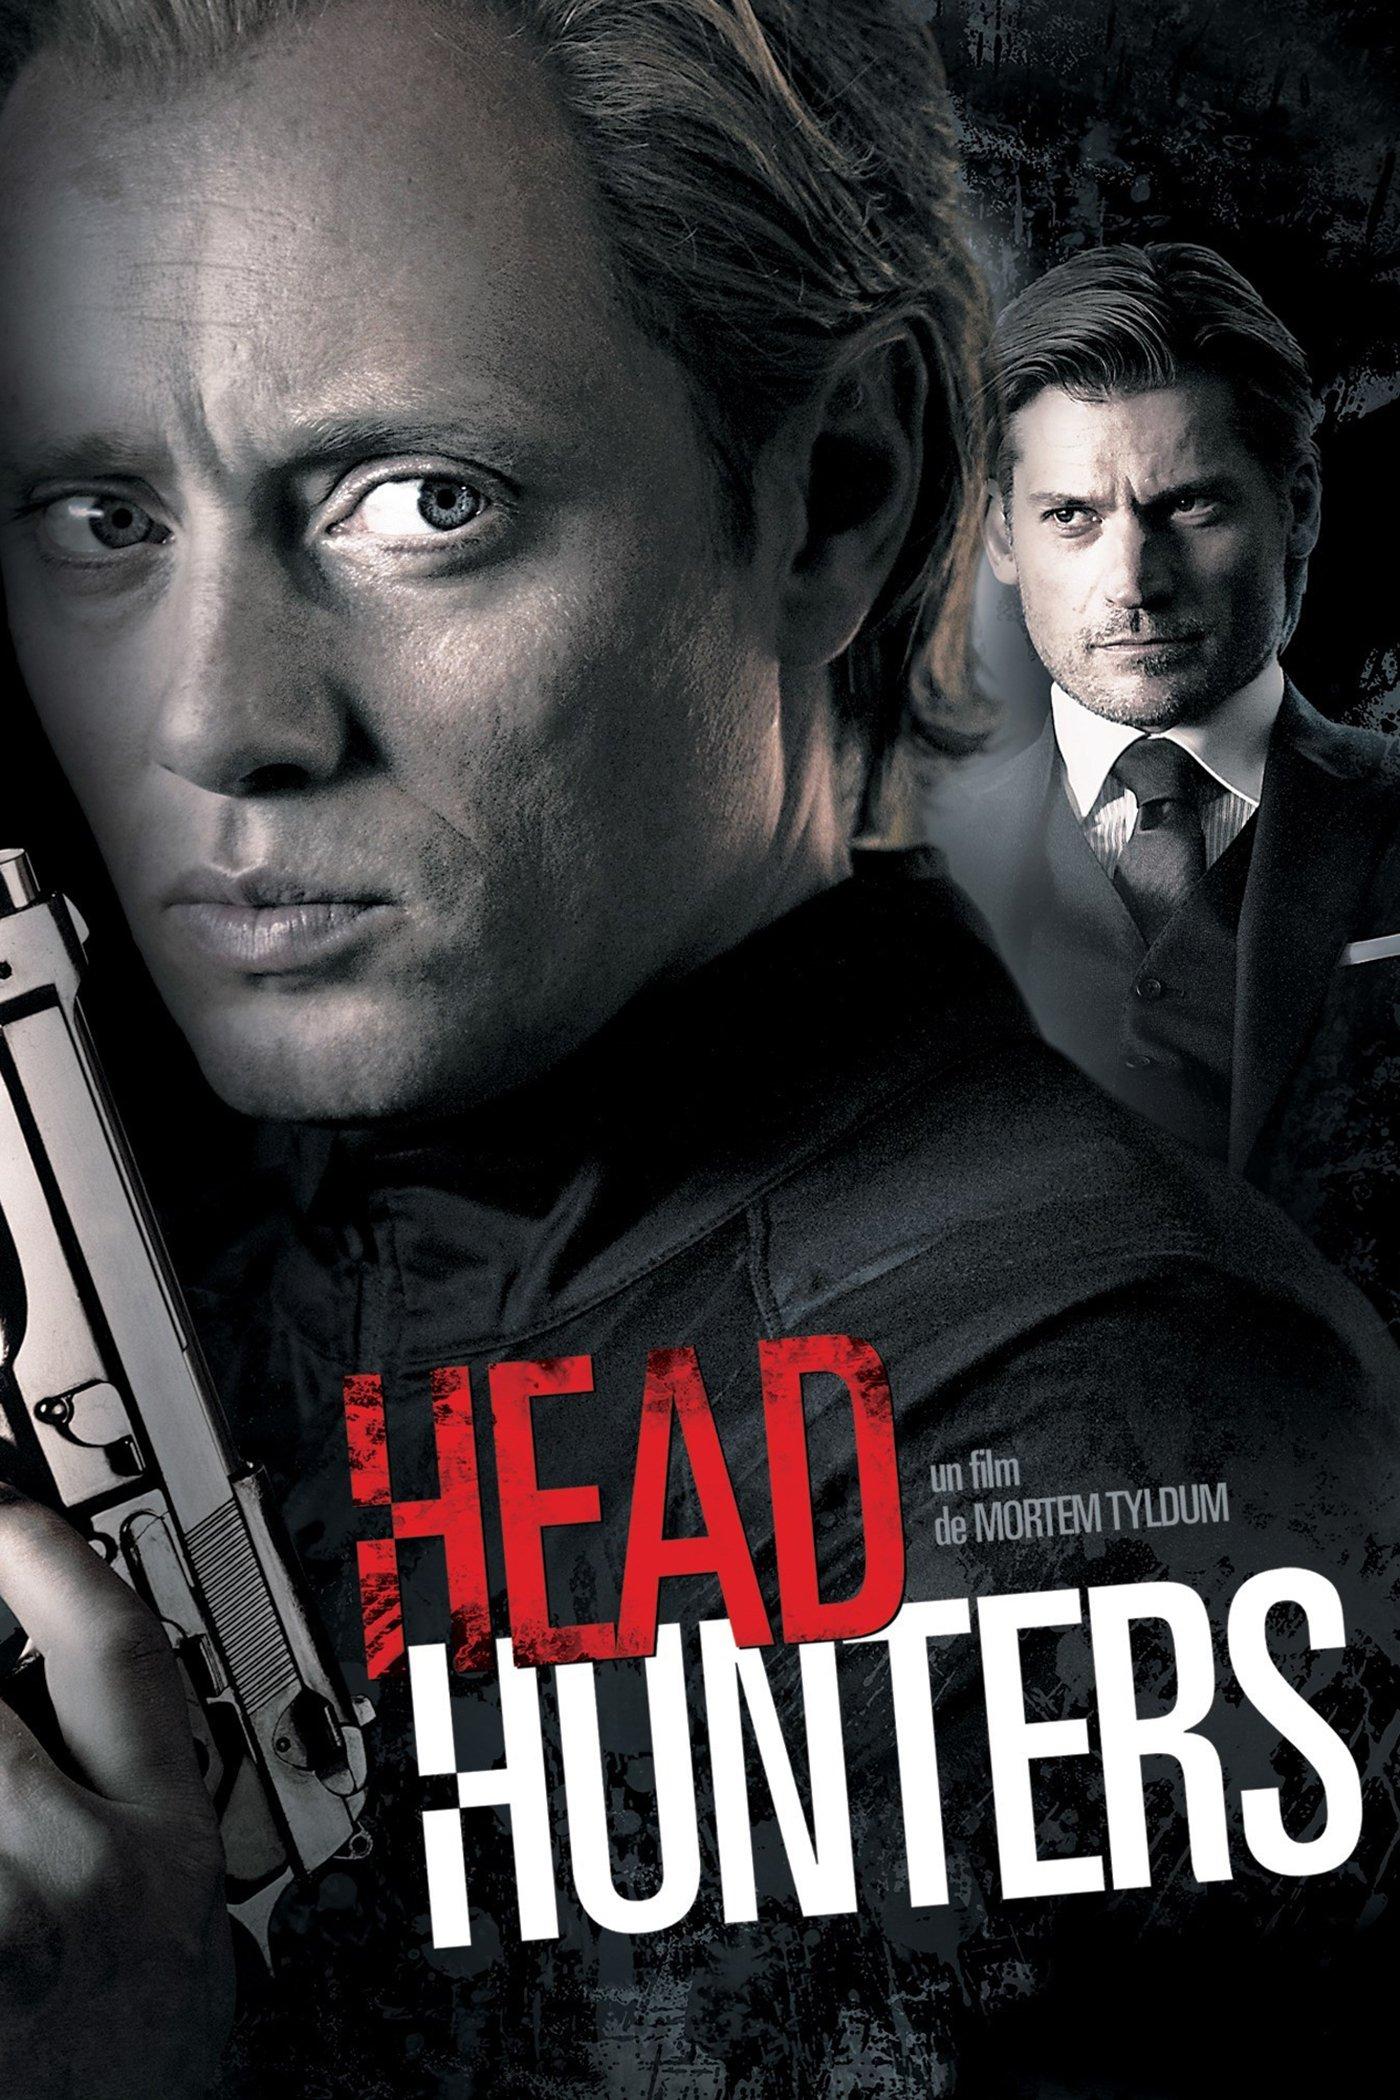 affiche du film Headhunters